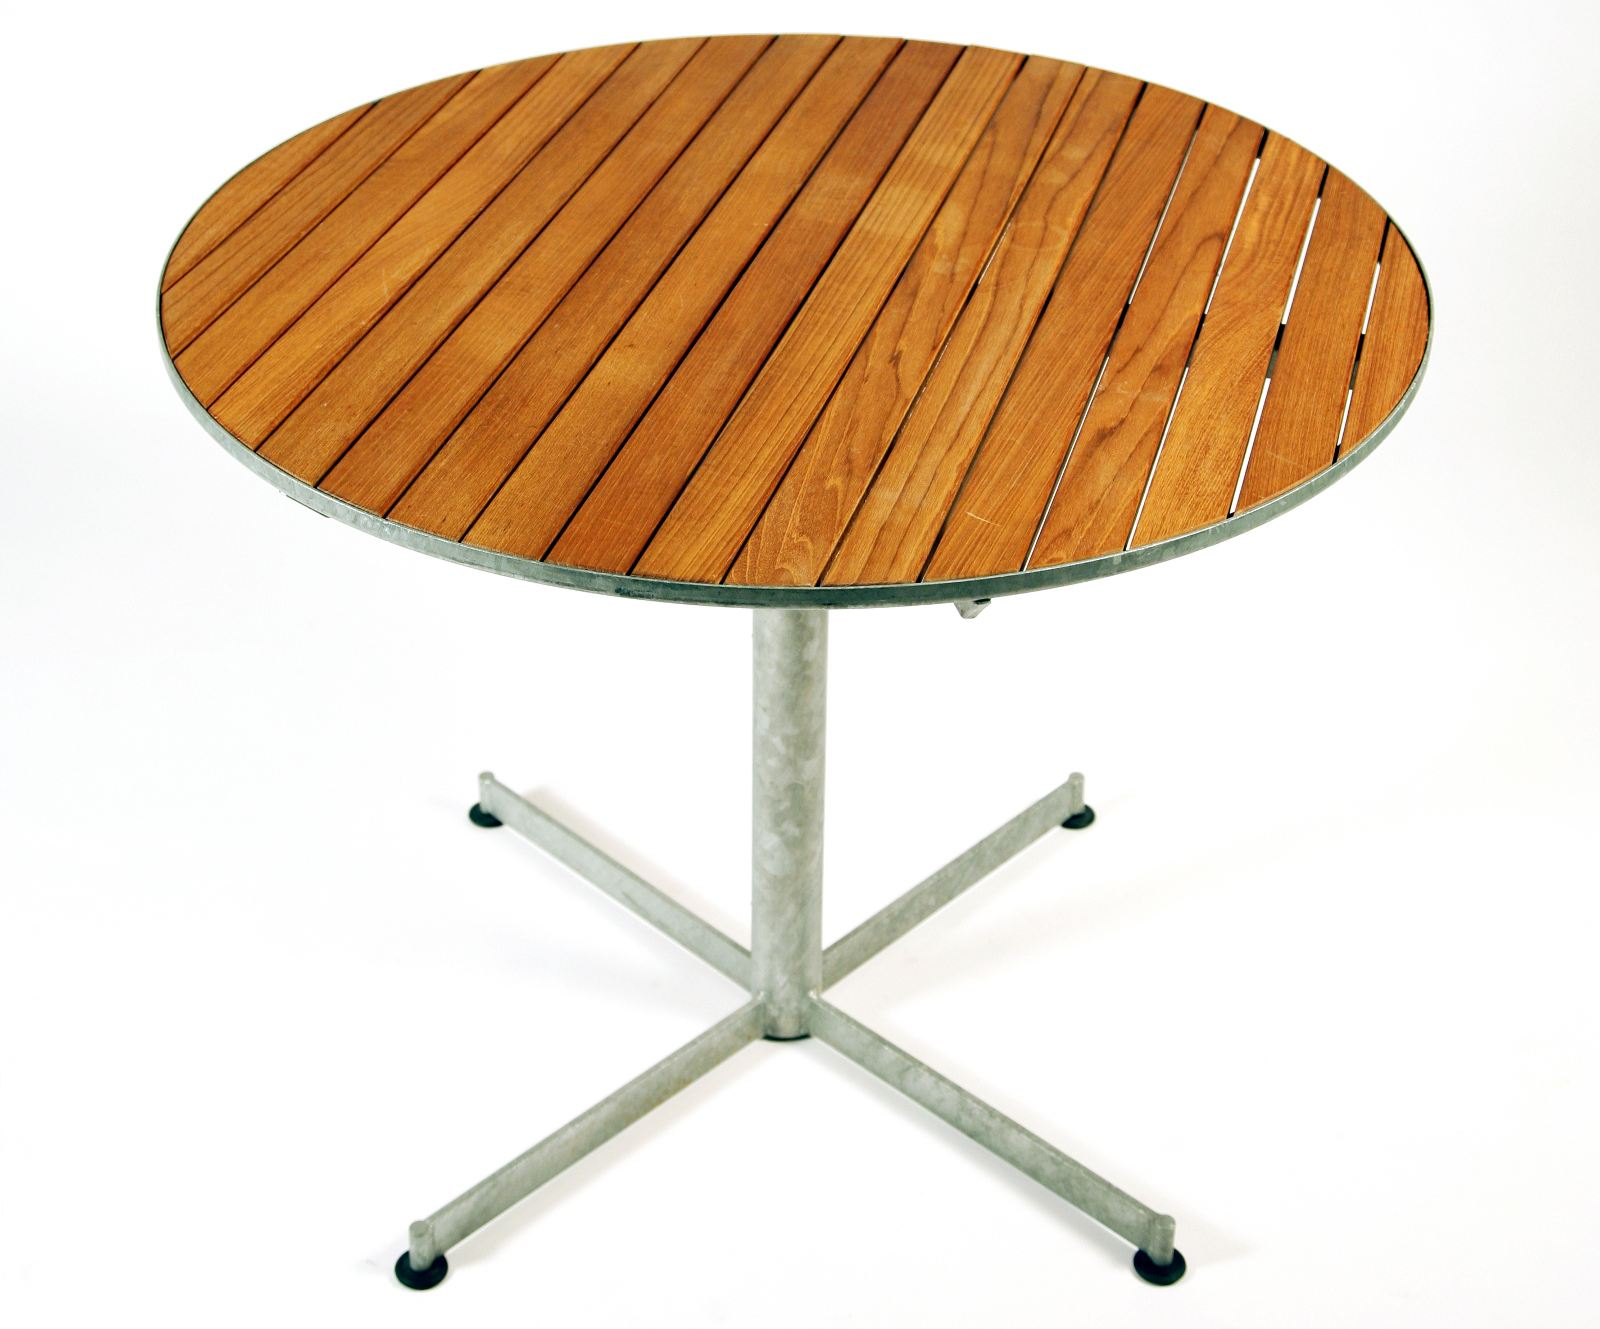 table ronde en teck terrace by inno interior oy design. Black Bedroom Furniture Sets. Home Design Ideas